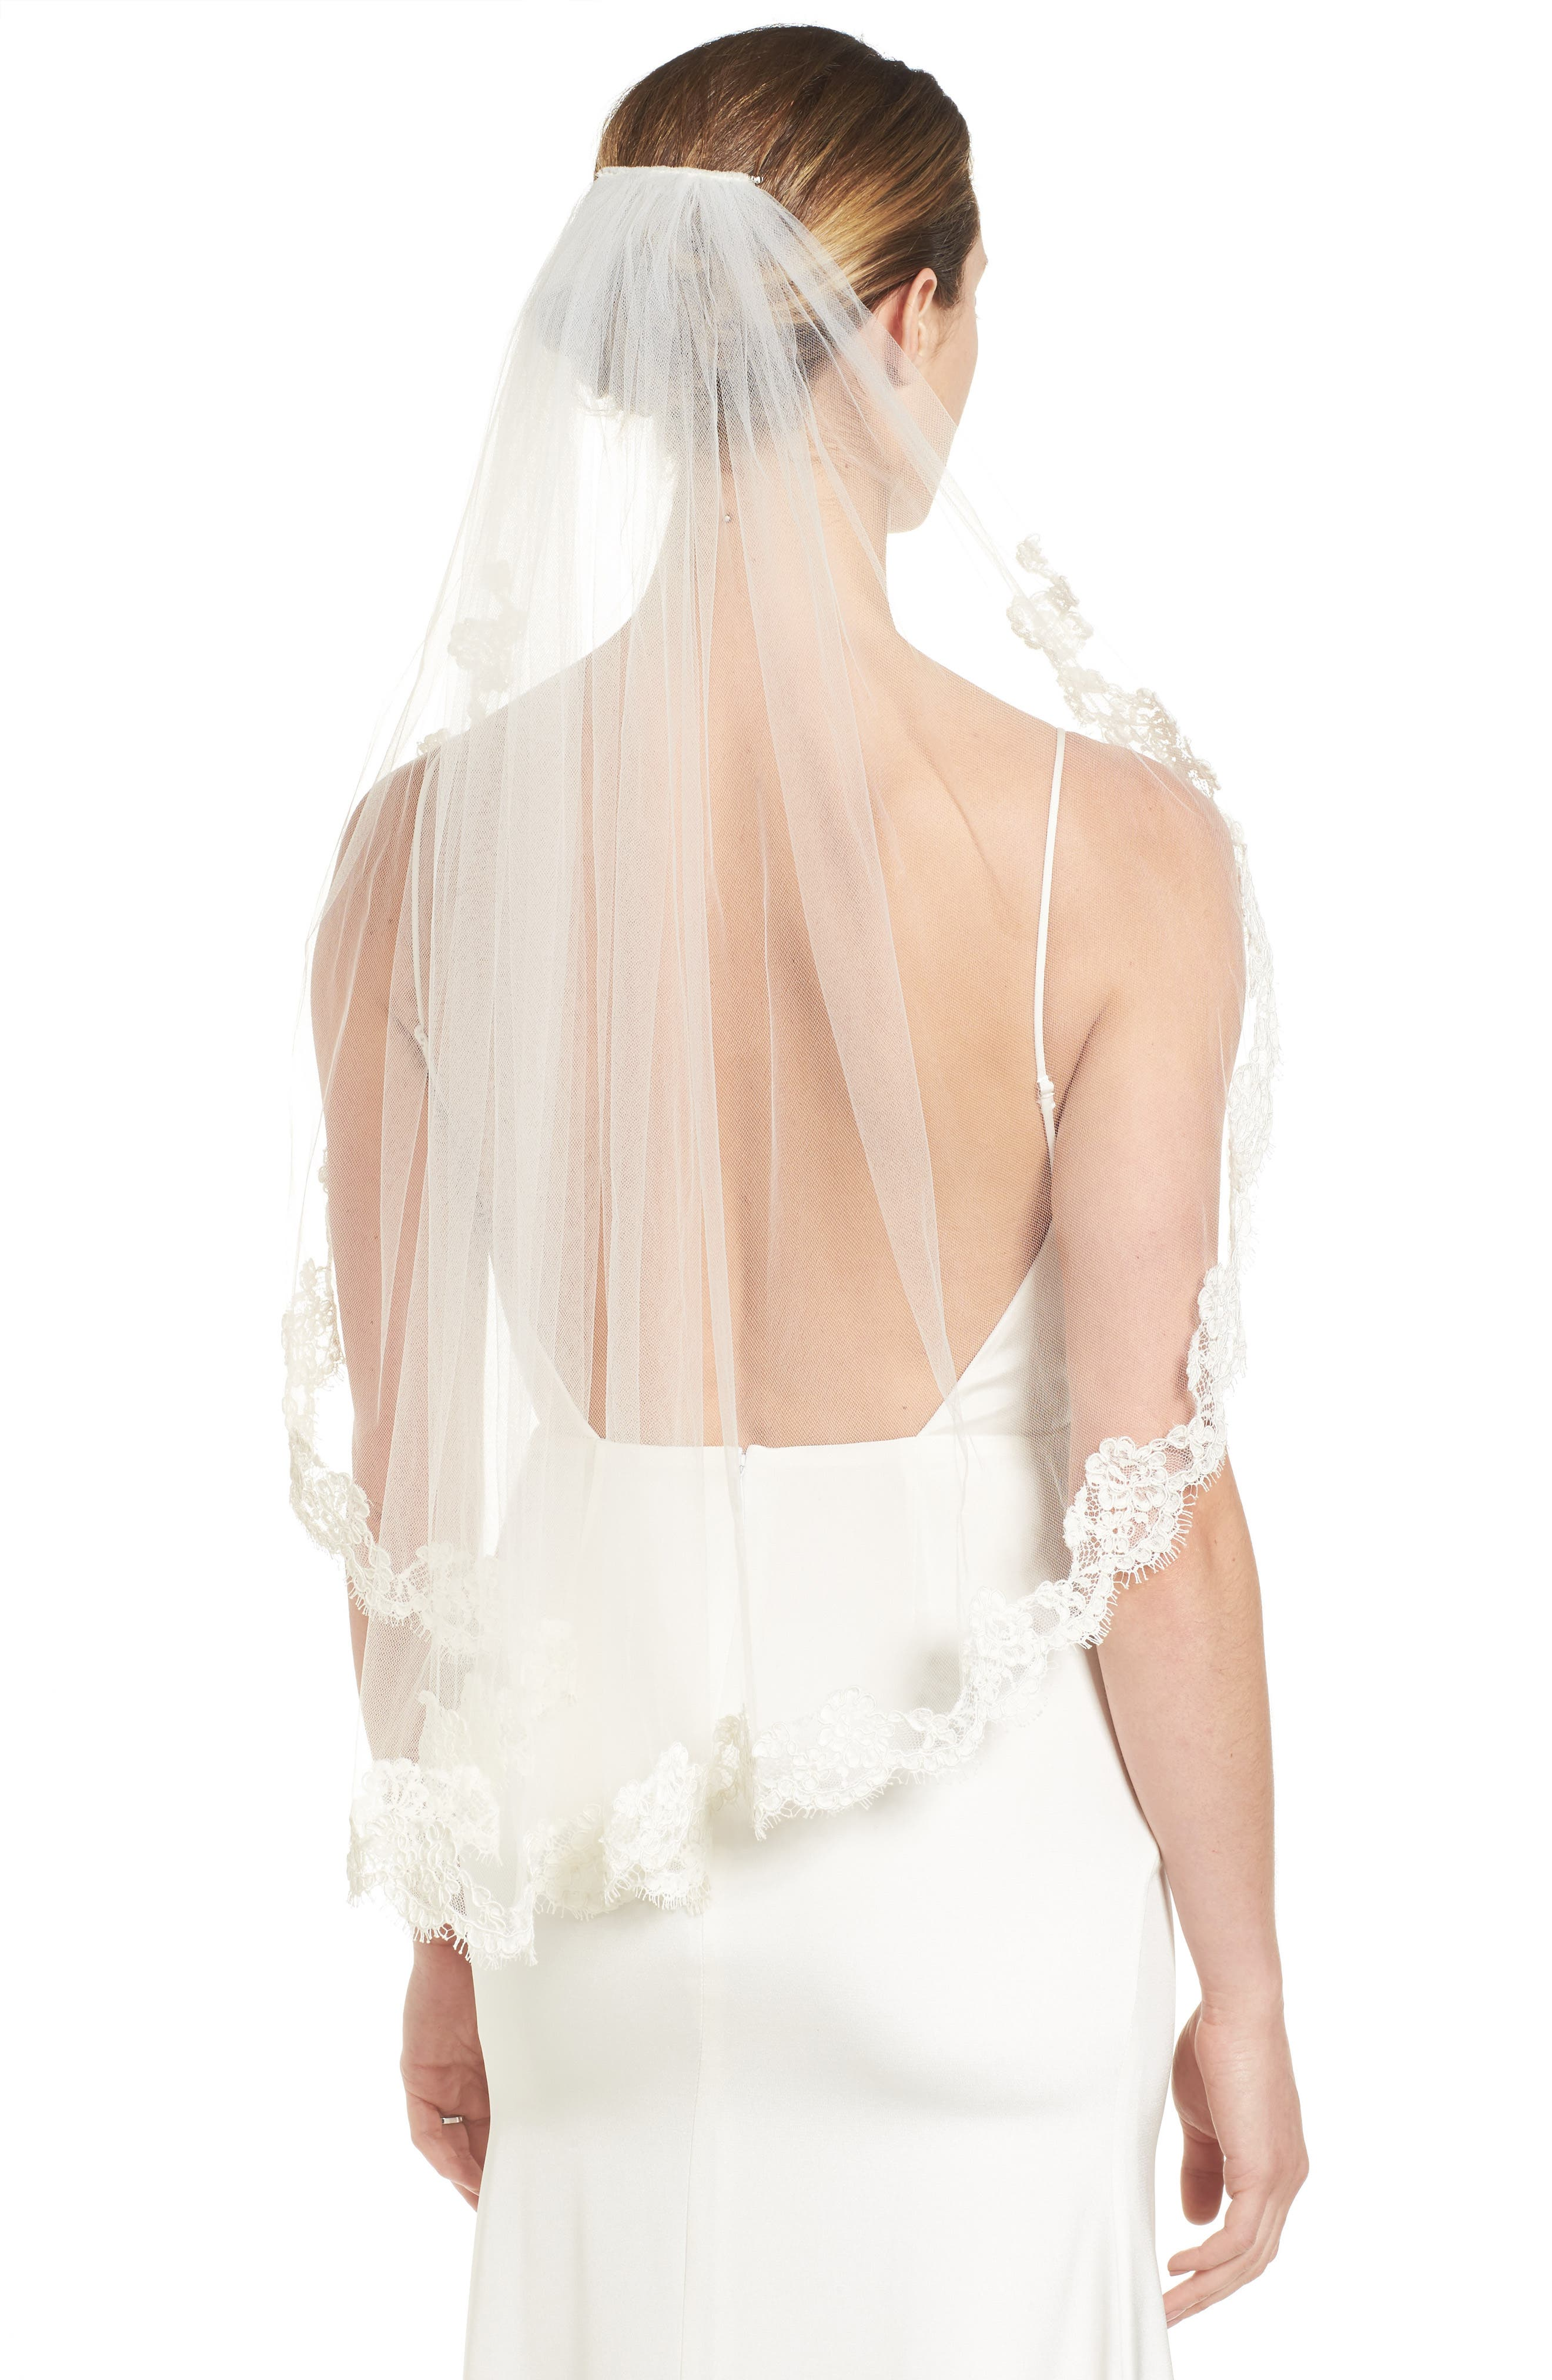 Poppy Lace Bridal Veil,                         Main,                         color, Light Ivory